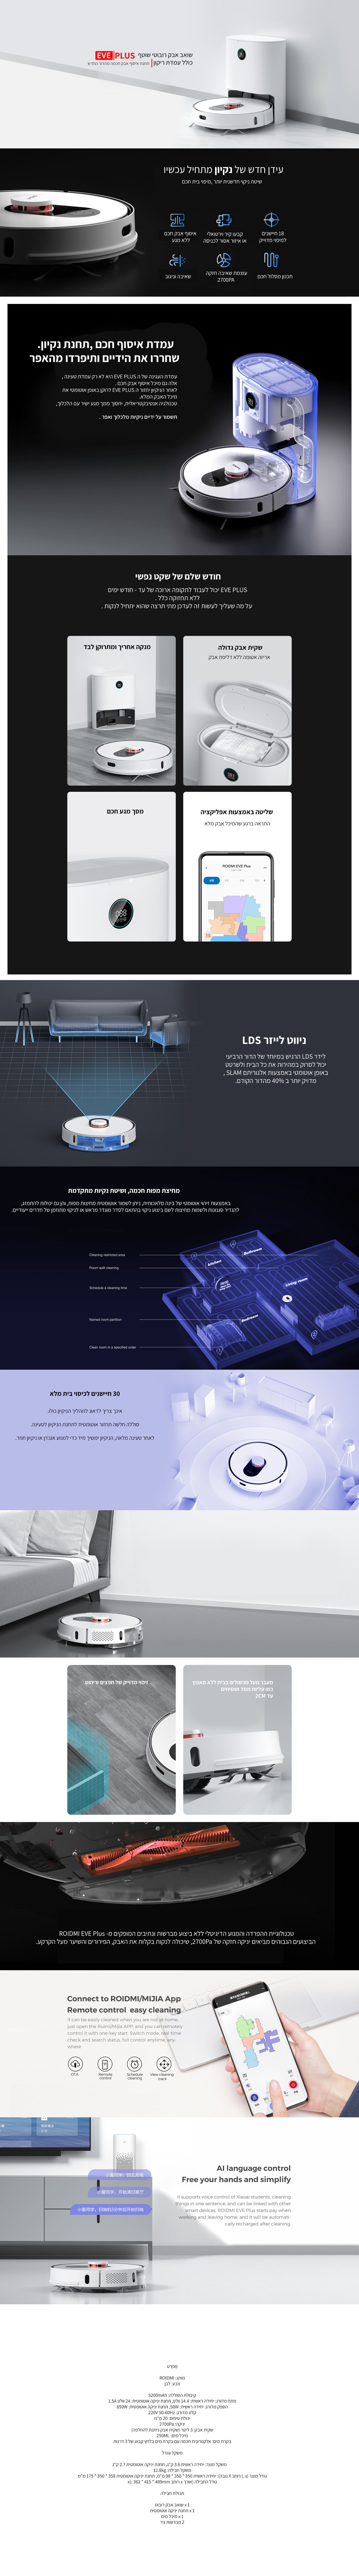 ROIDMI EVE Plus – שואב רובוטי שוטף עם עמדת ריקון עצמי - יבואן רשמי מבית שיאומי יבוא מקביל | שואבי אבק רובוטי של Xiaomi הכי זולים בארץ! 25